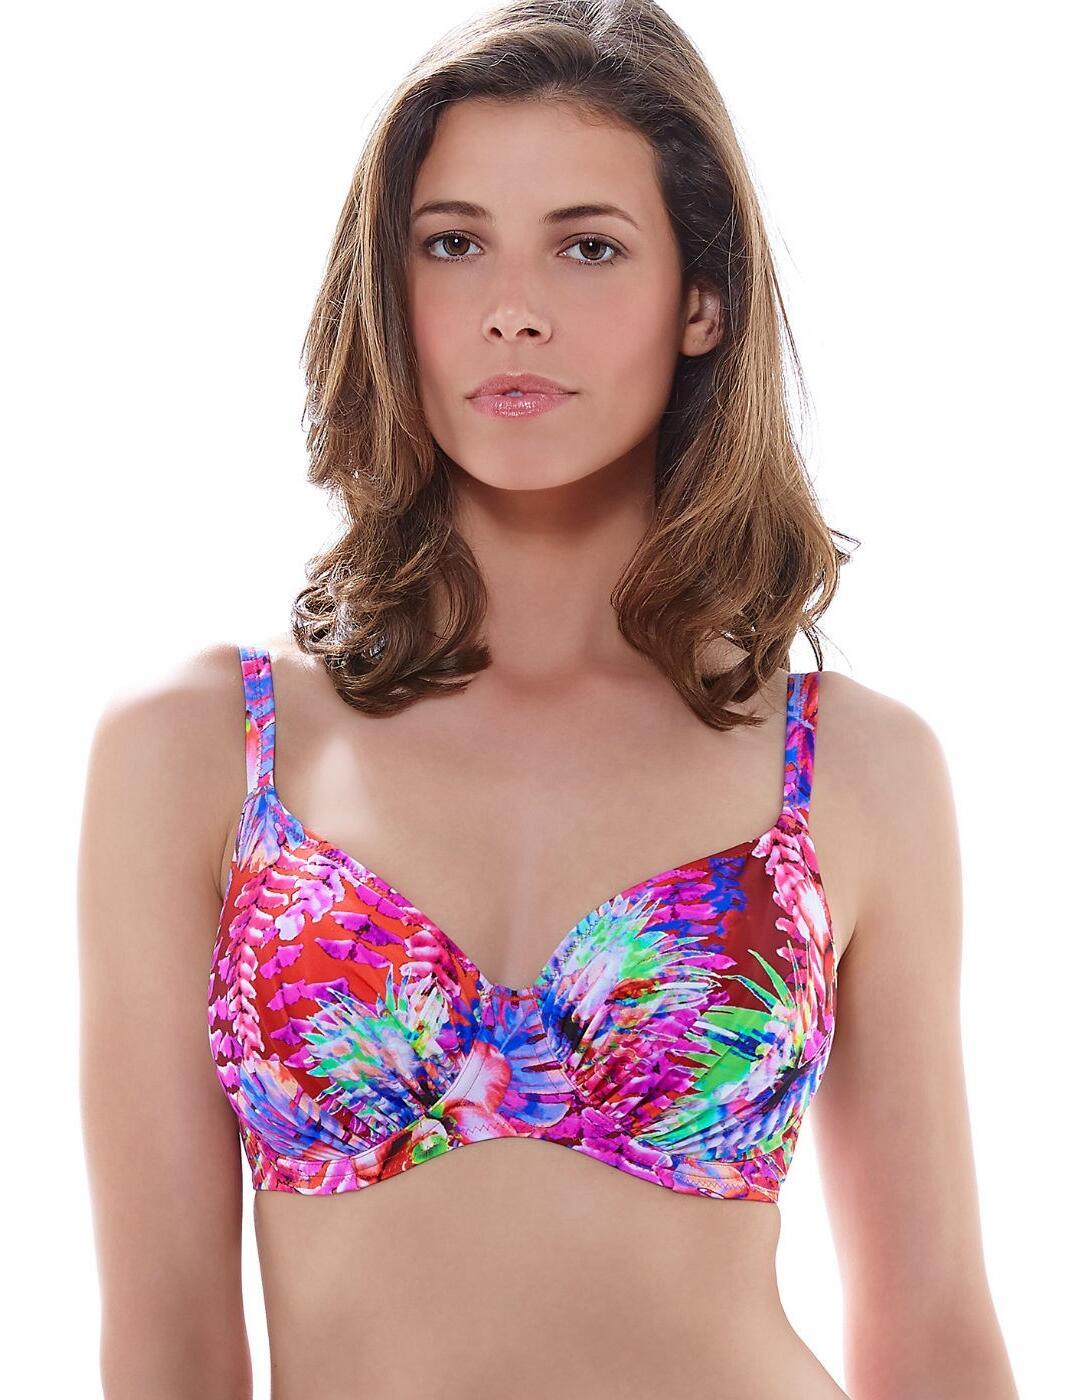 6170 Fantasie Punta Cana Gathered Full Cup Bikini Top Hot Coral - 6170 Full Cup Bikini Top